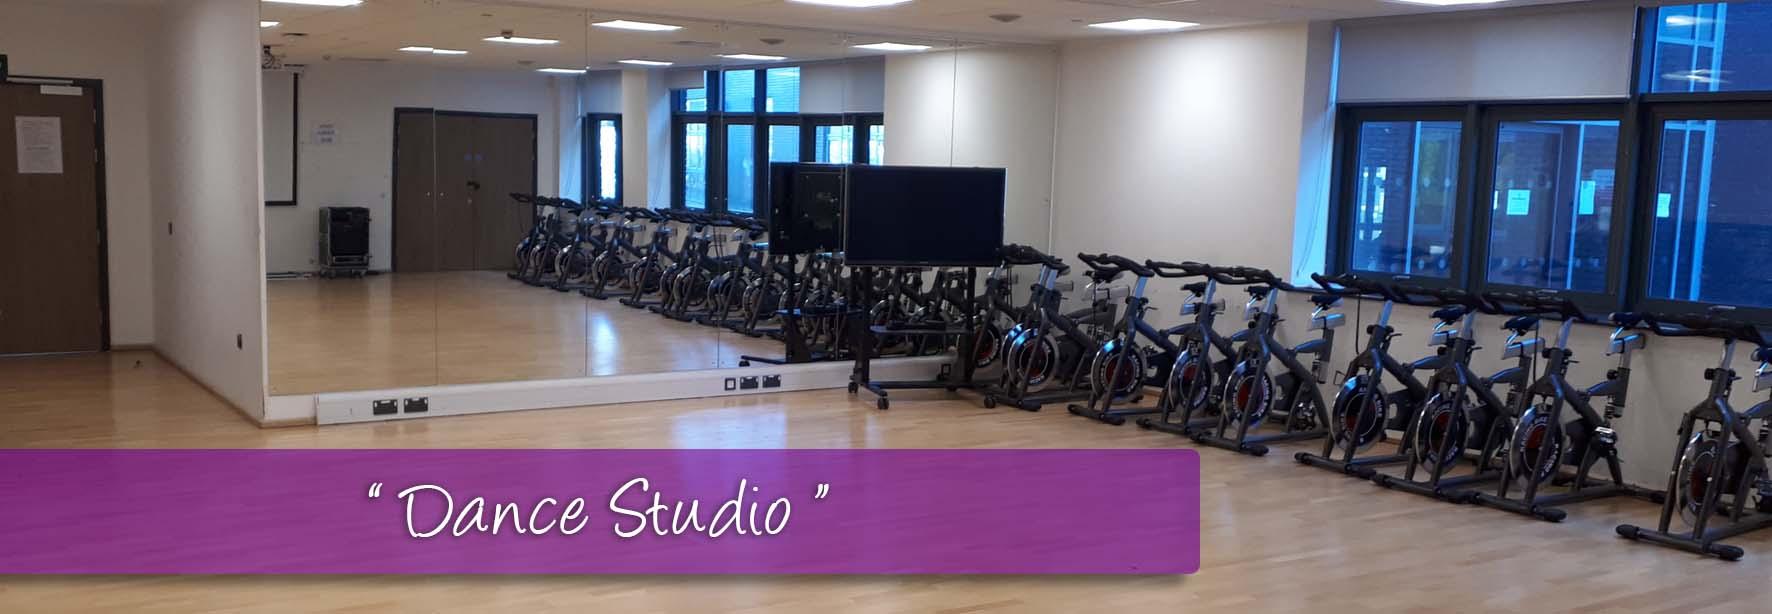 Dance_Studio